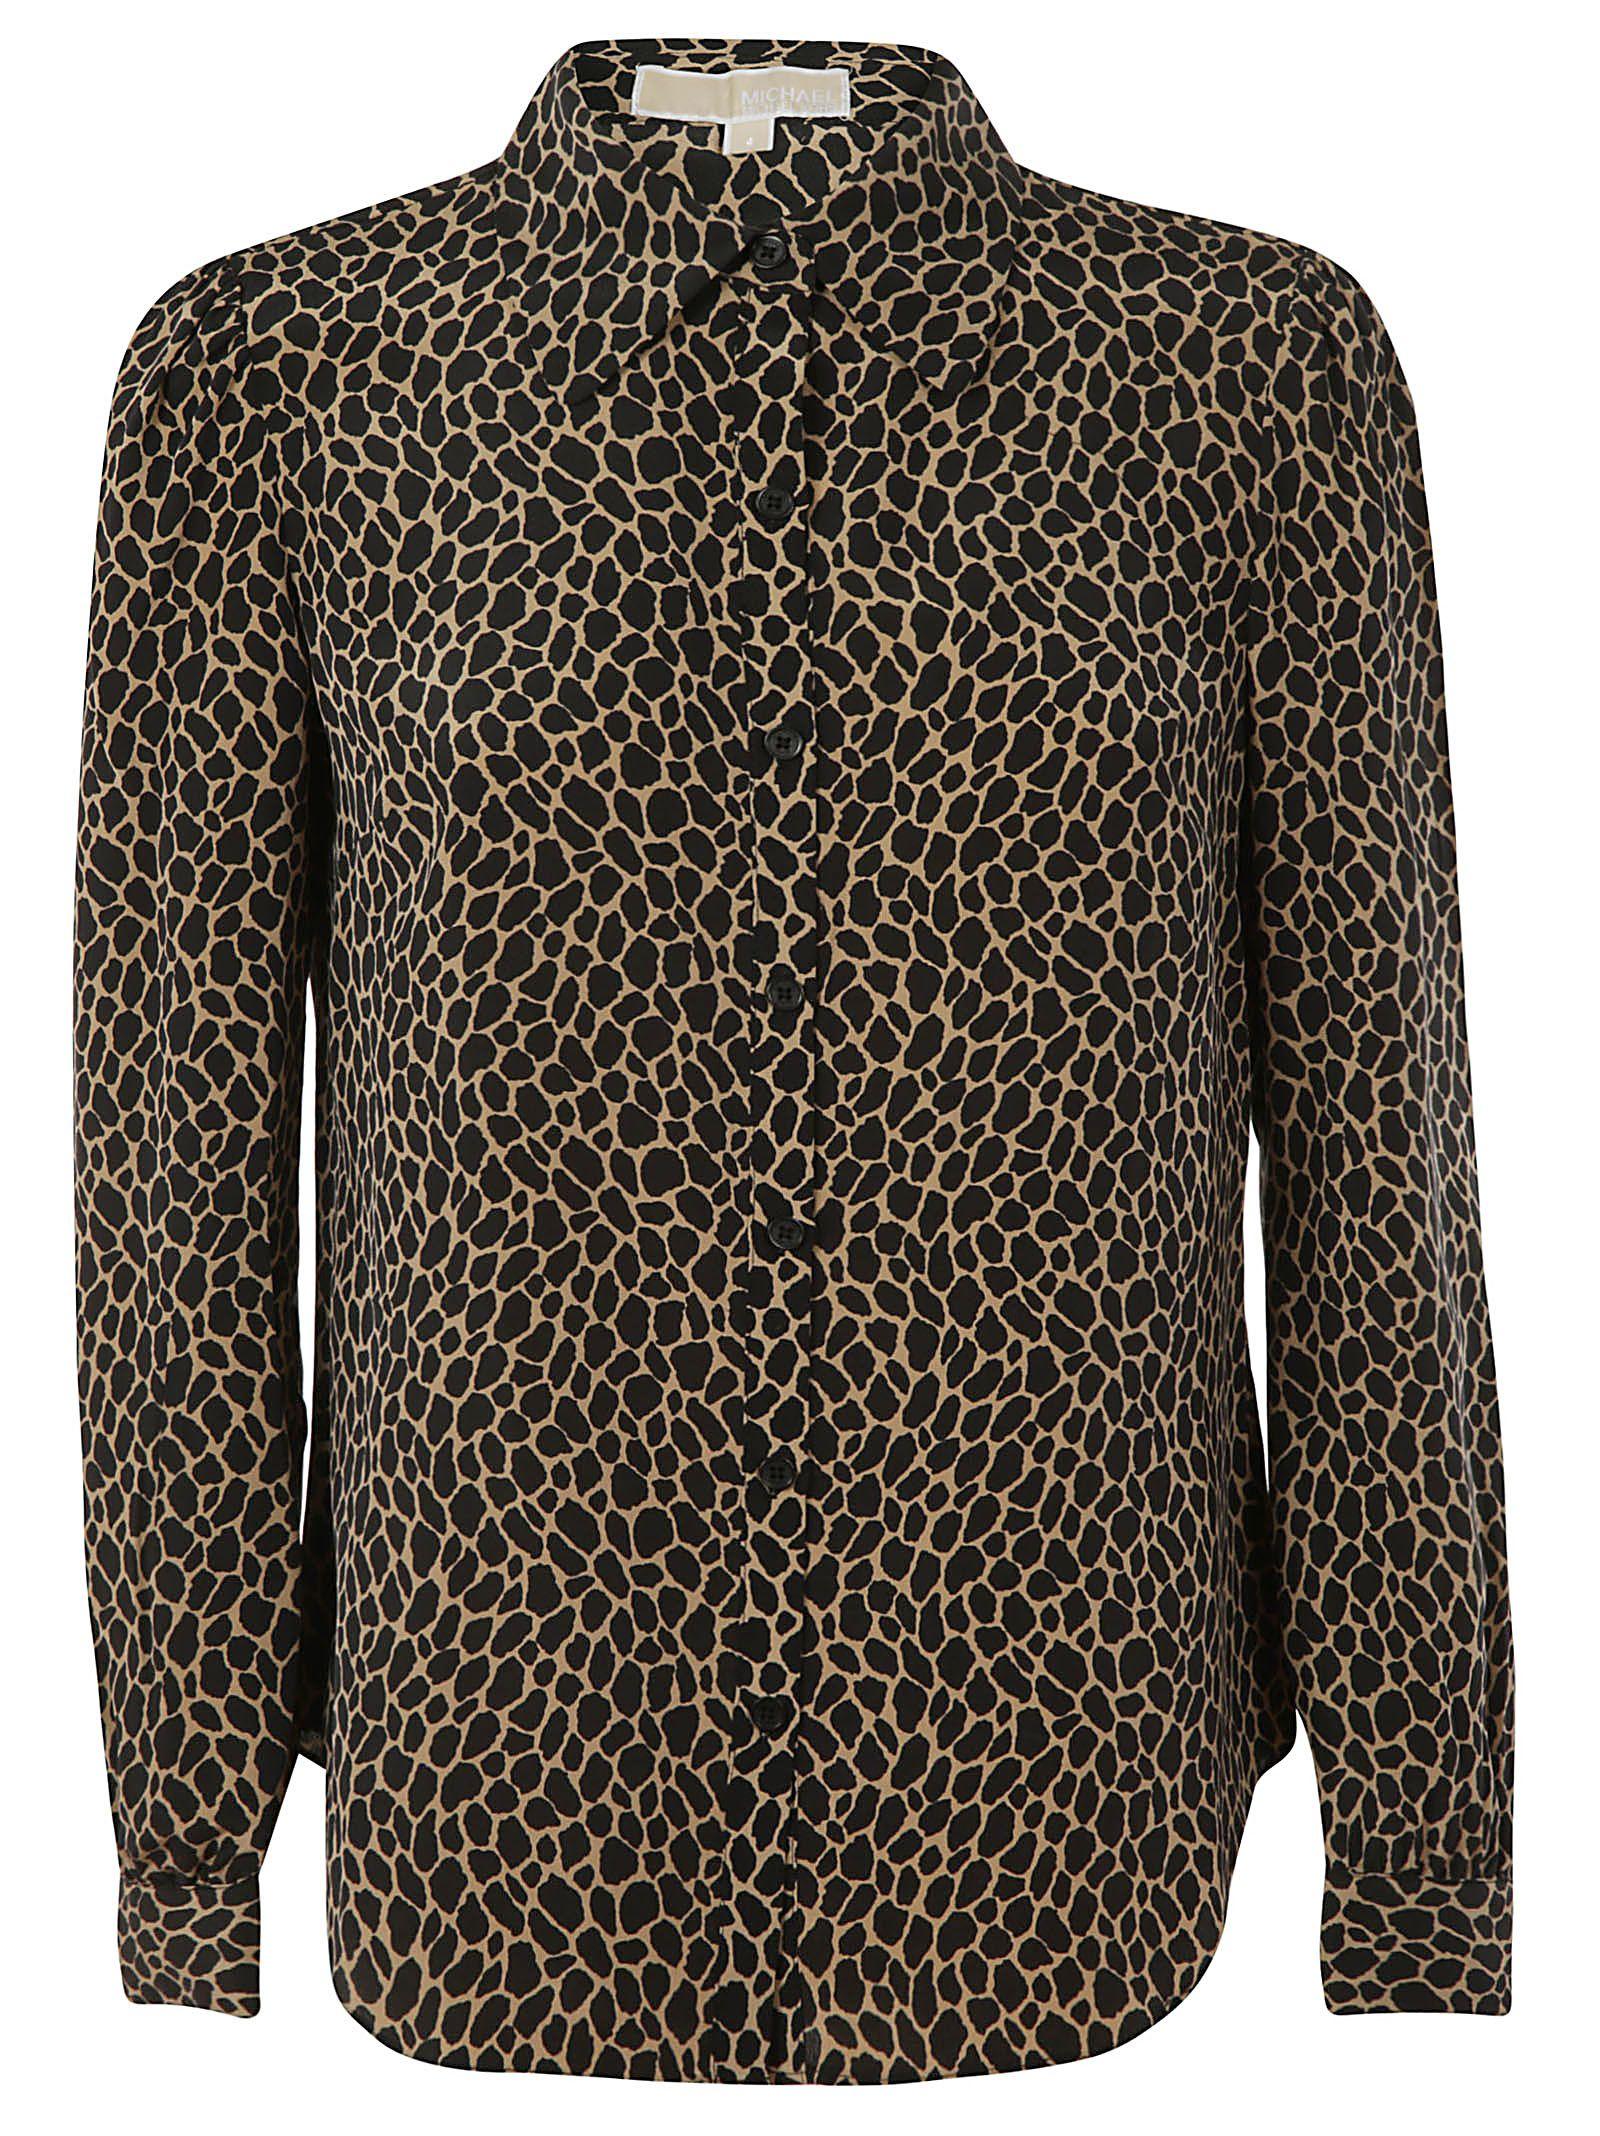 Michael Kors Leopard Print Fitted Shirt